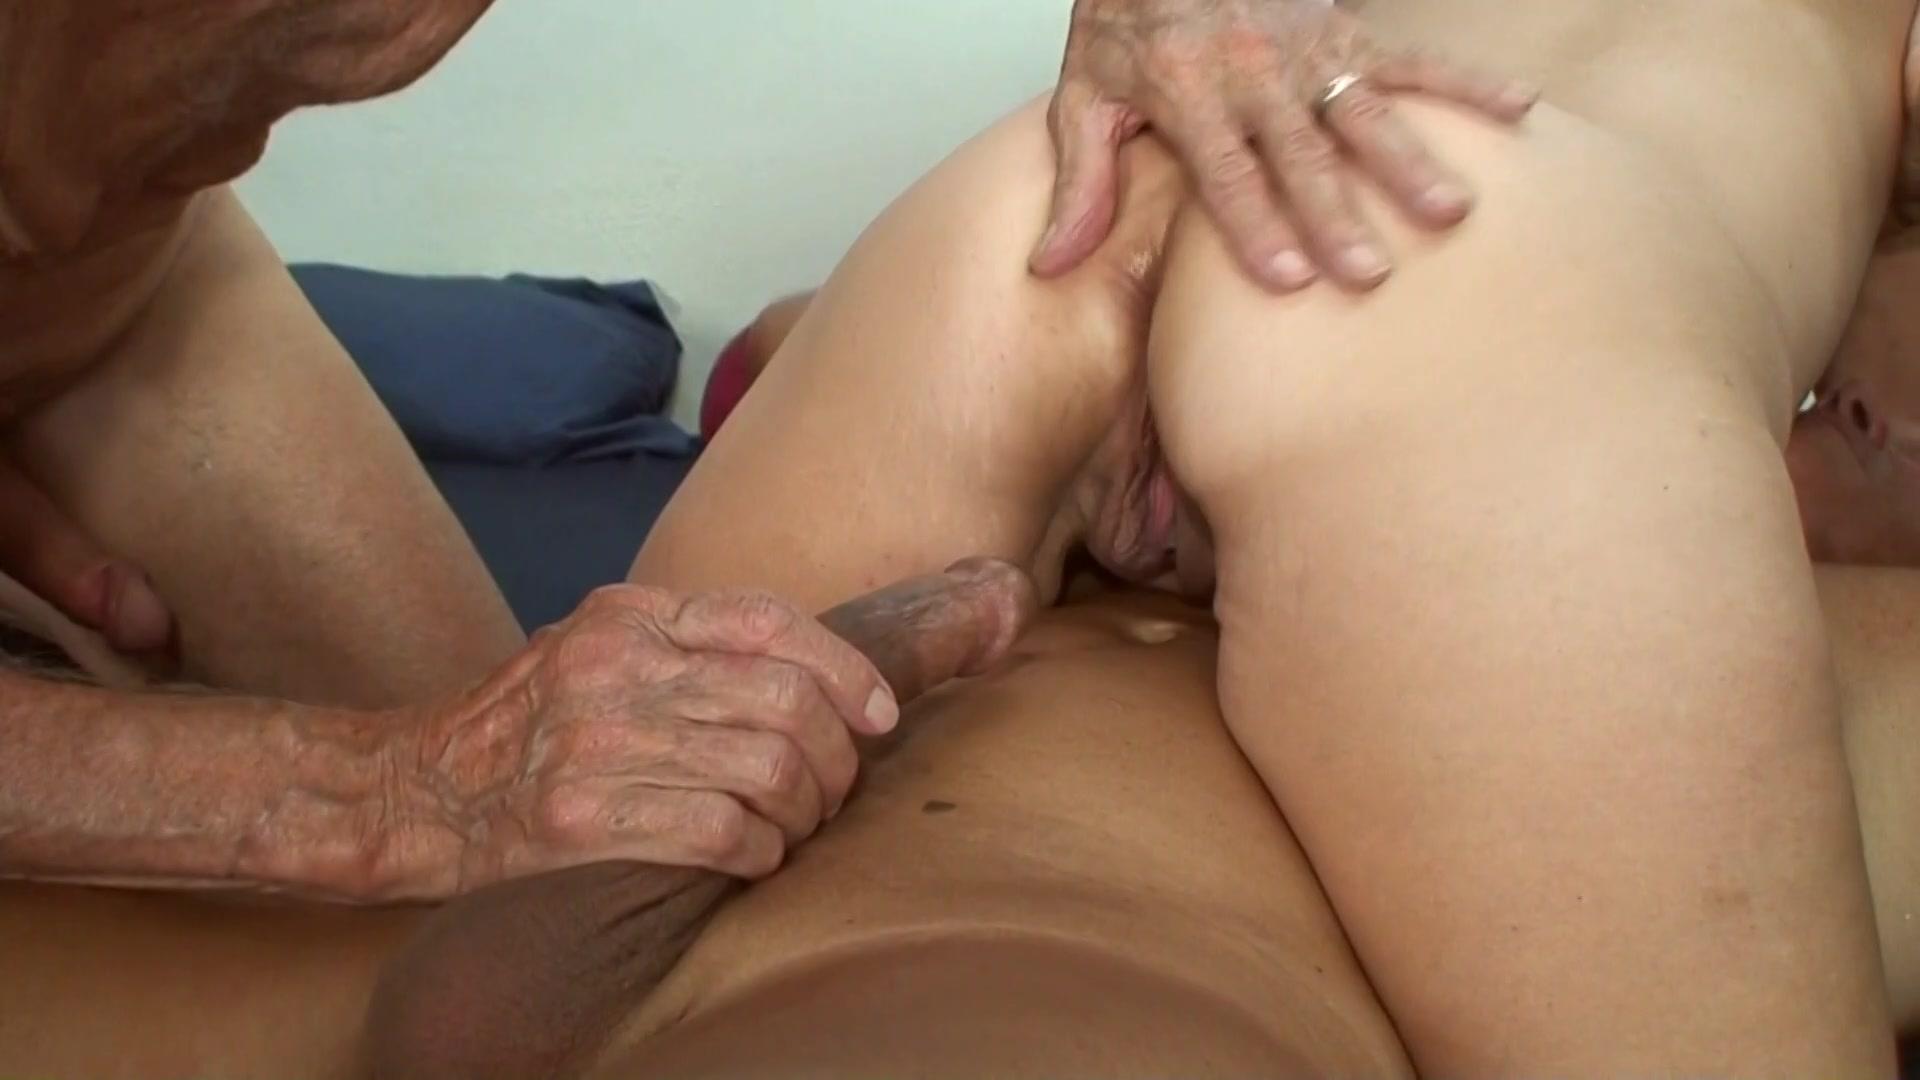 Dentist pantyhose video